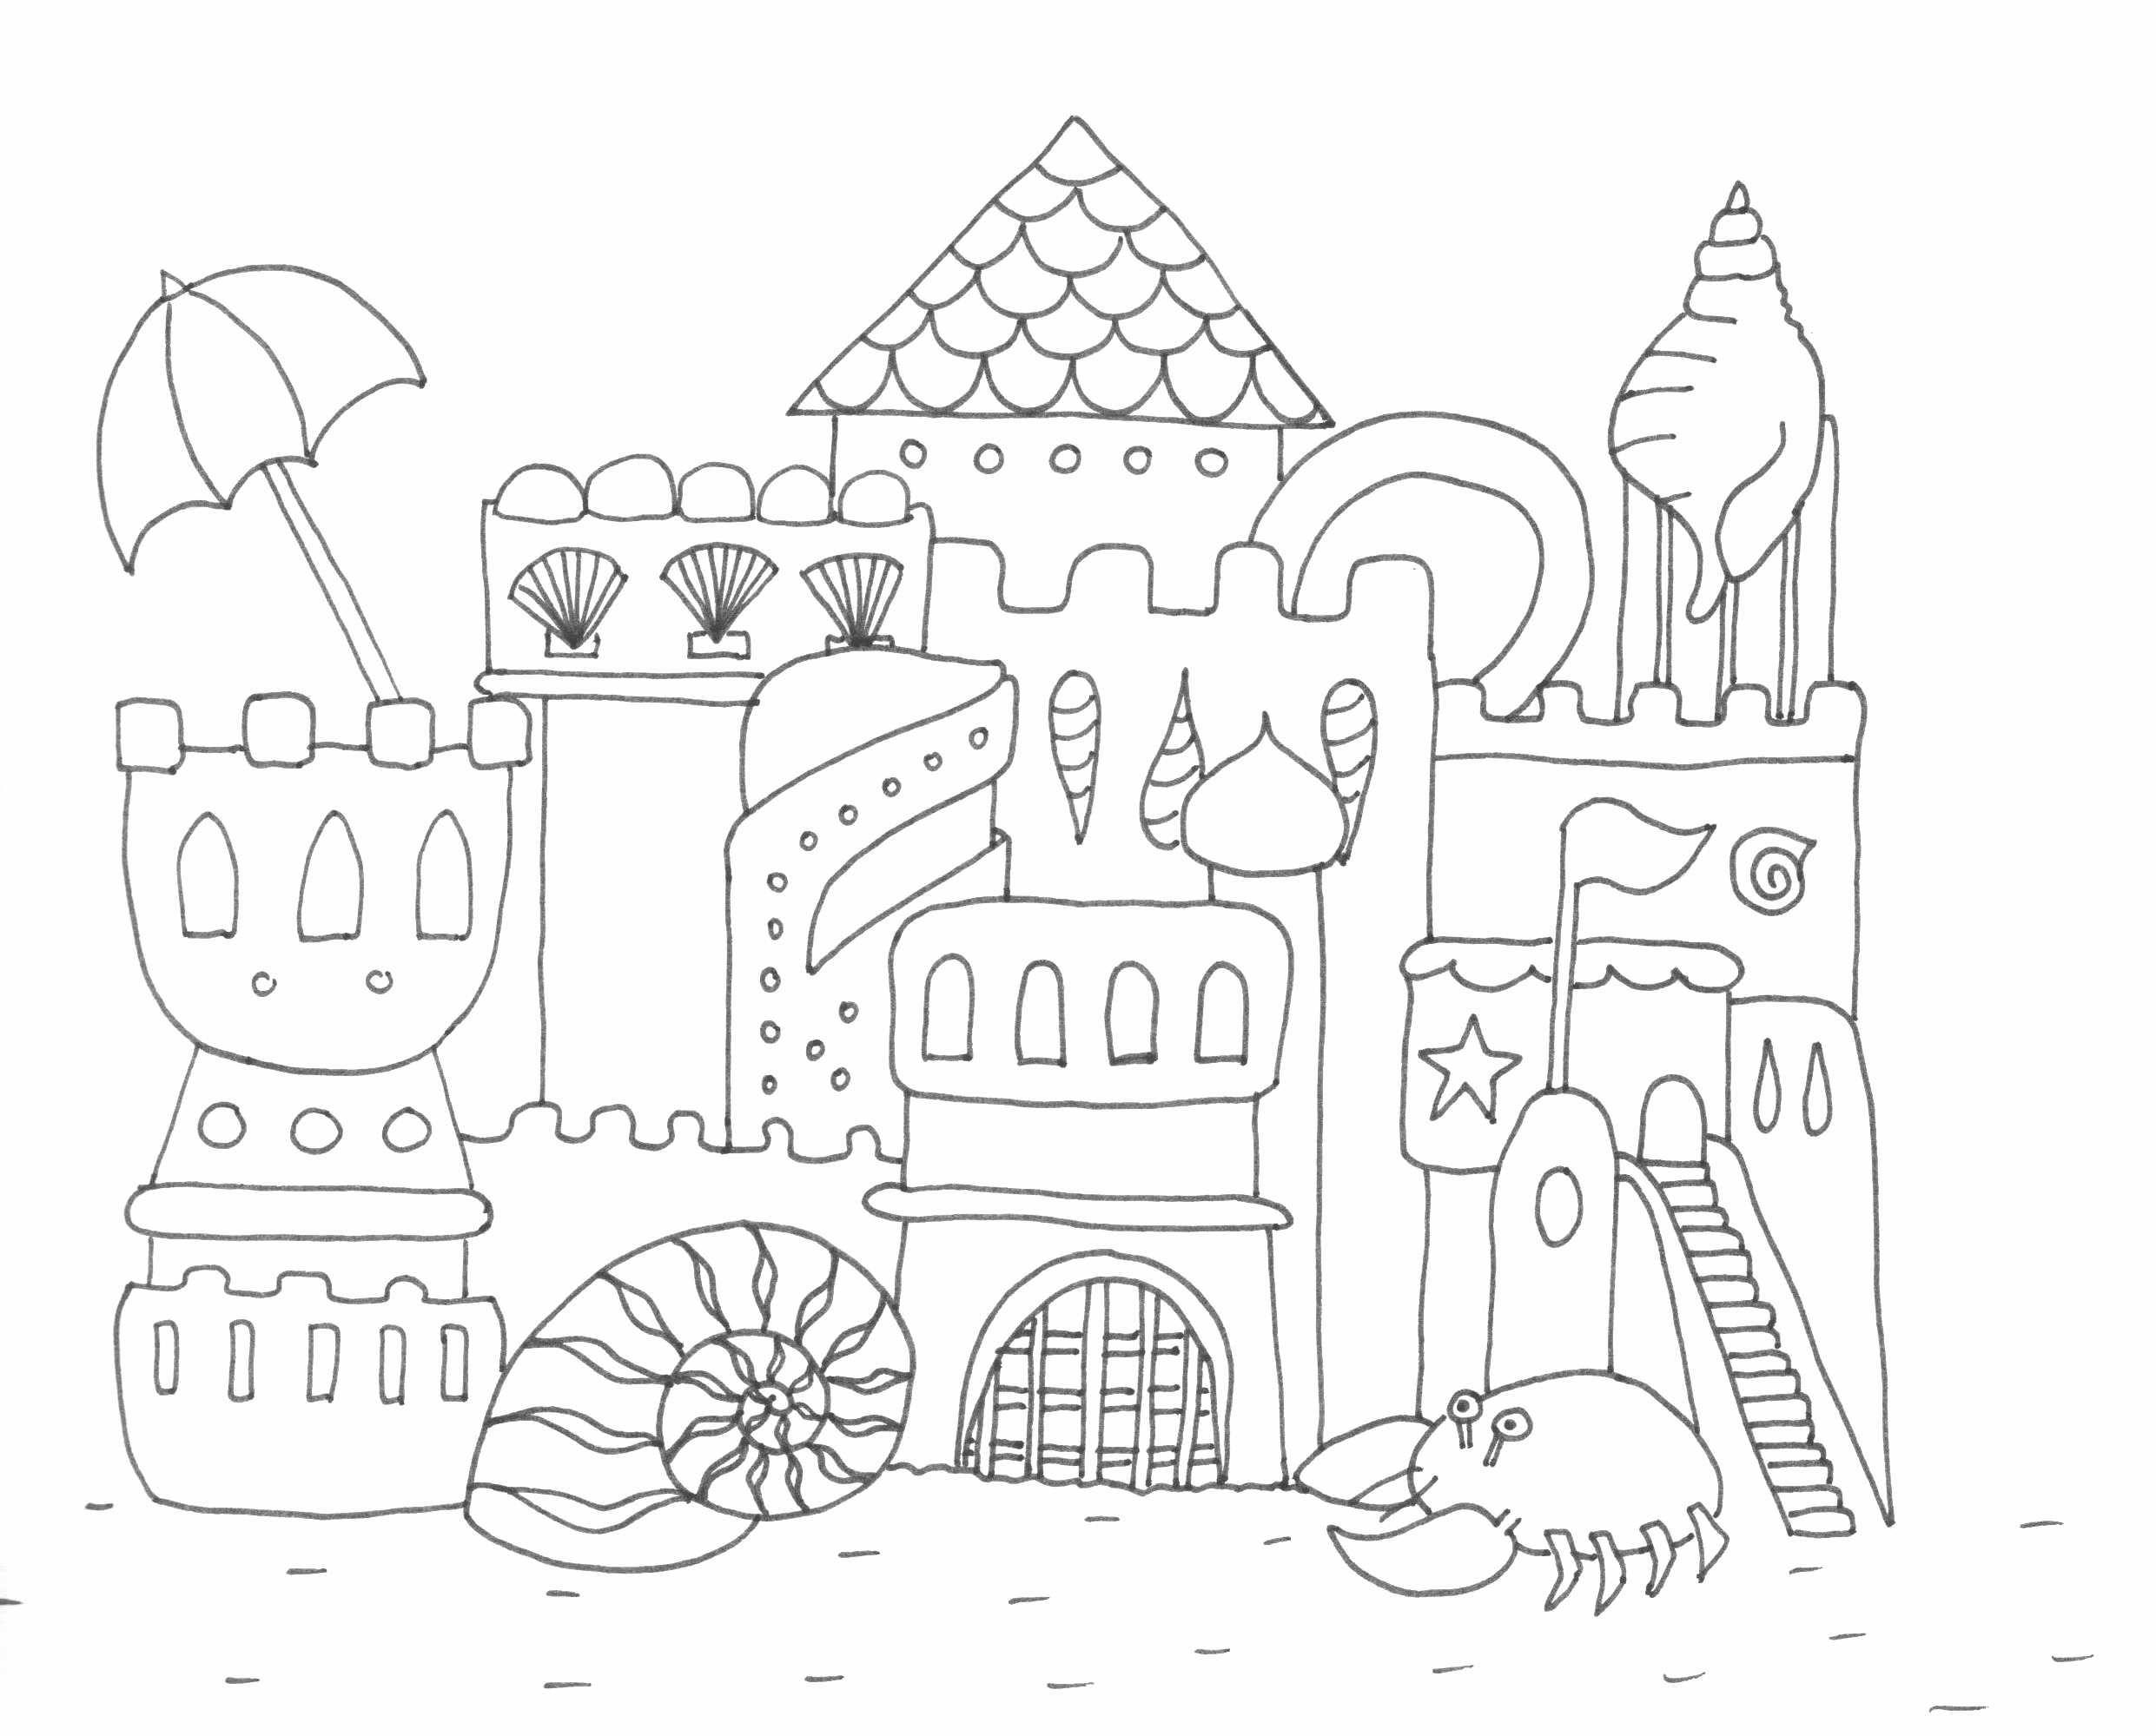 Homokvar Rajz Drawing Sandcastle Coloring Page Szinezo